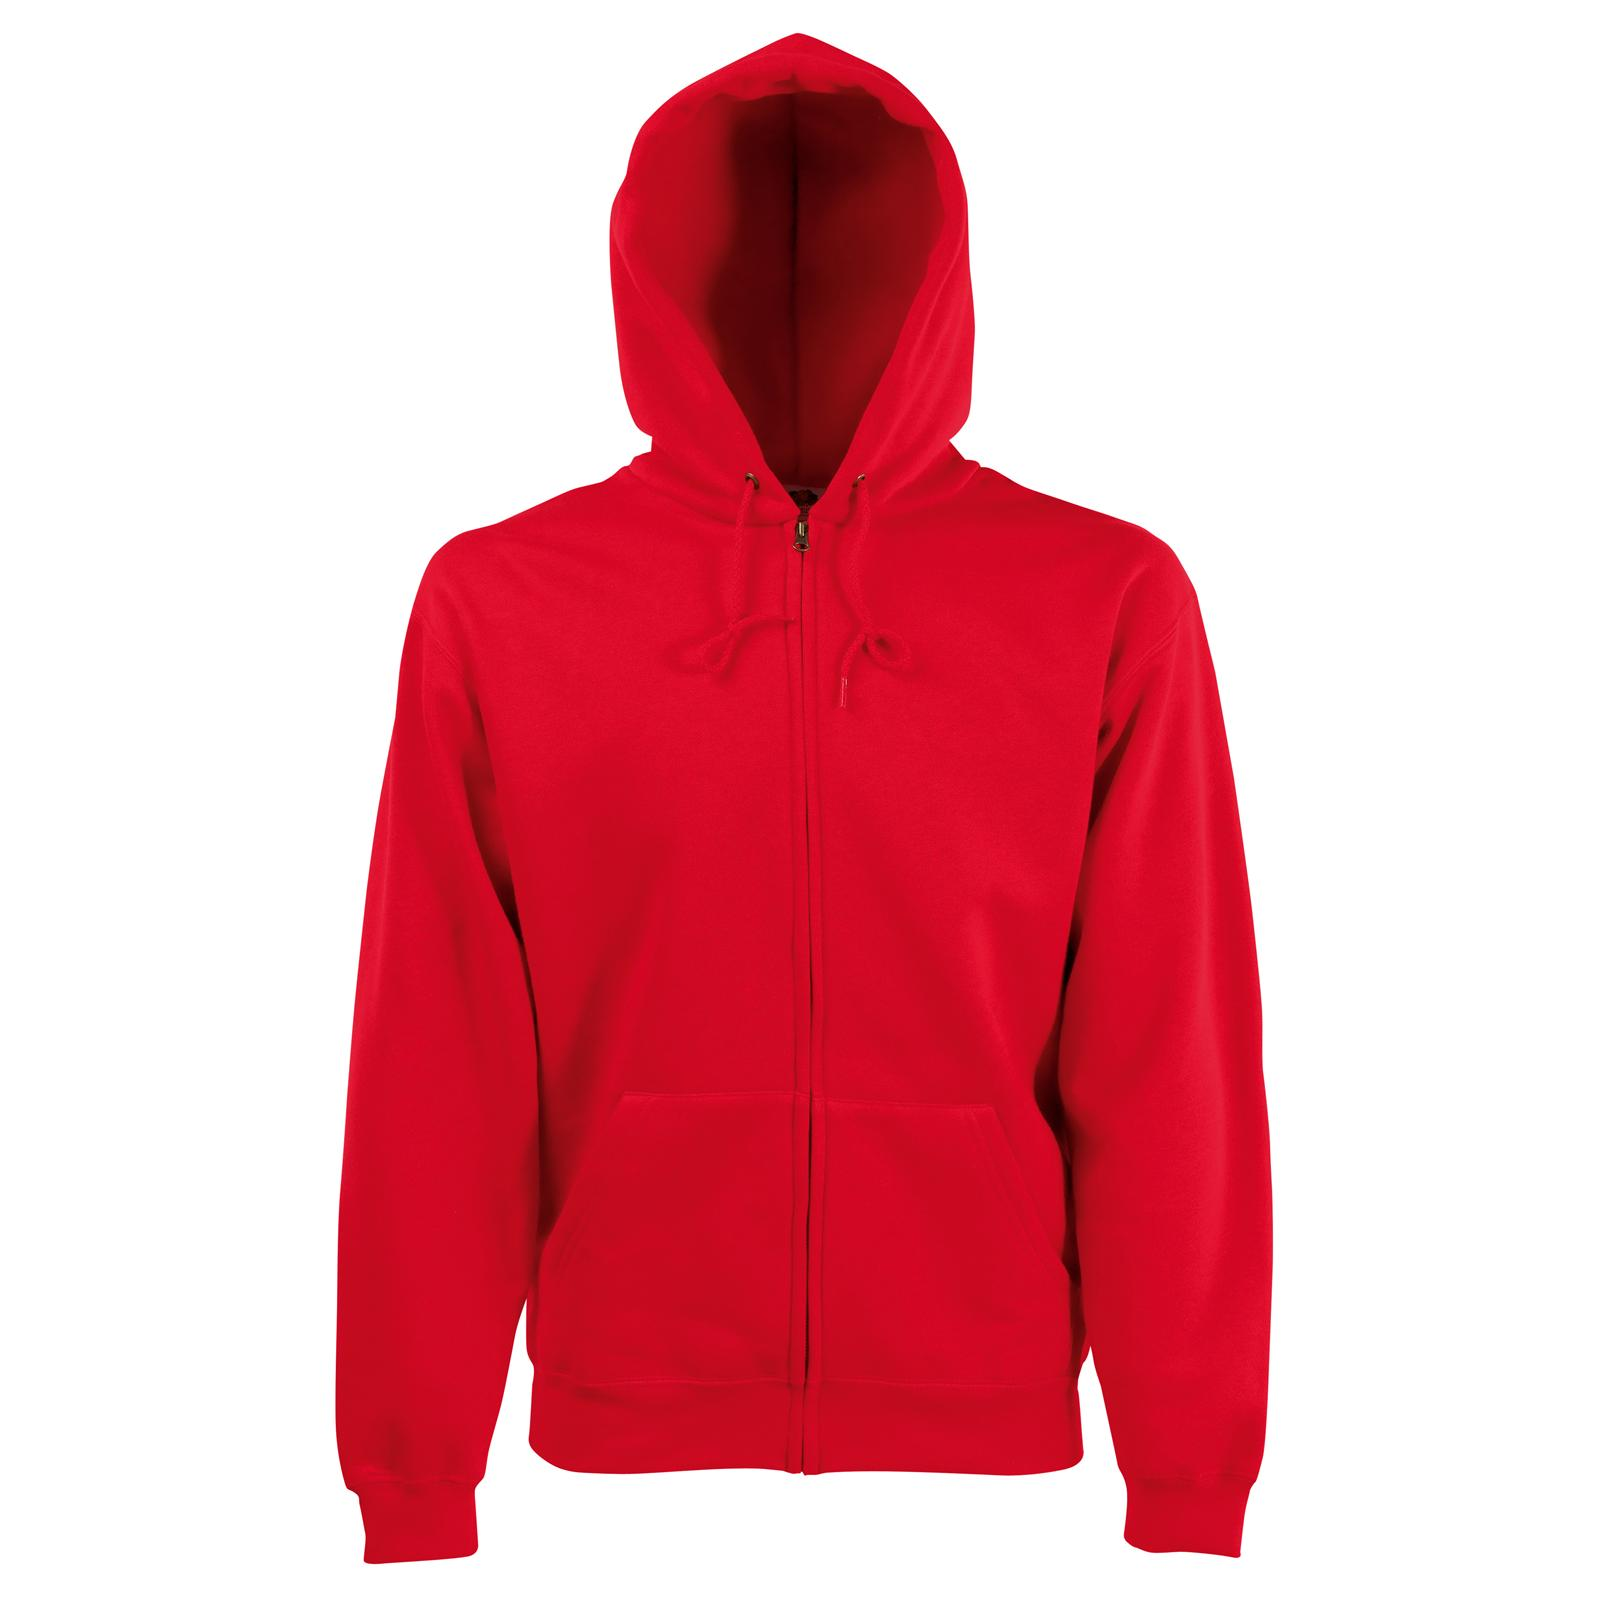 new fruit of the loom mens zip hoodie sweatshirt jacket in 8 colours s xxl ebay. Black Bedroom Furniture Sets. Home Design Ideas